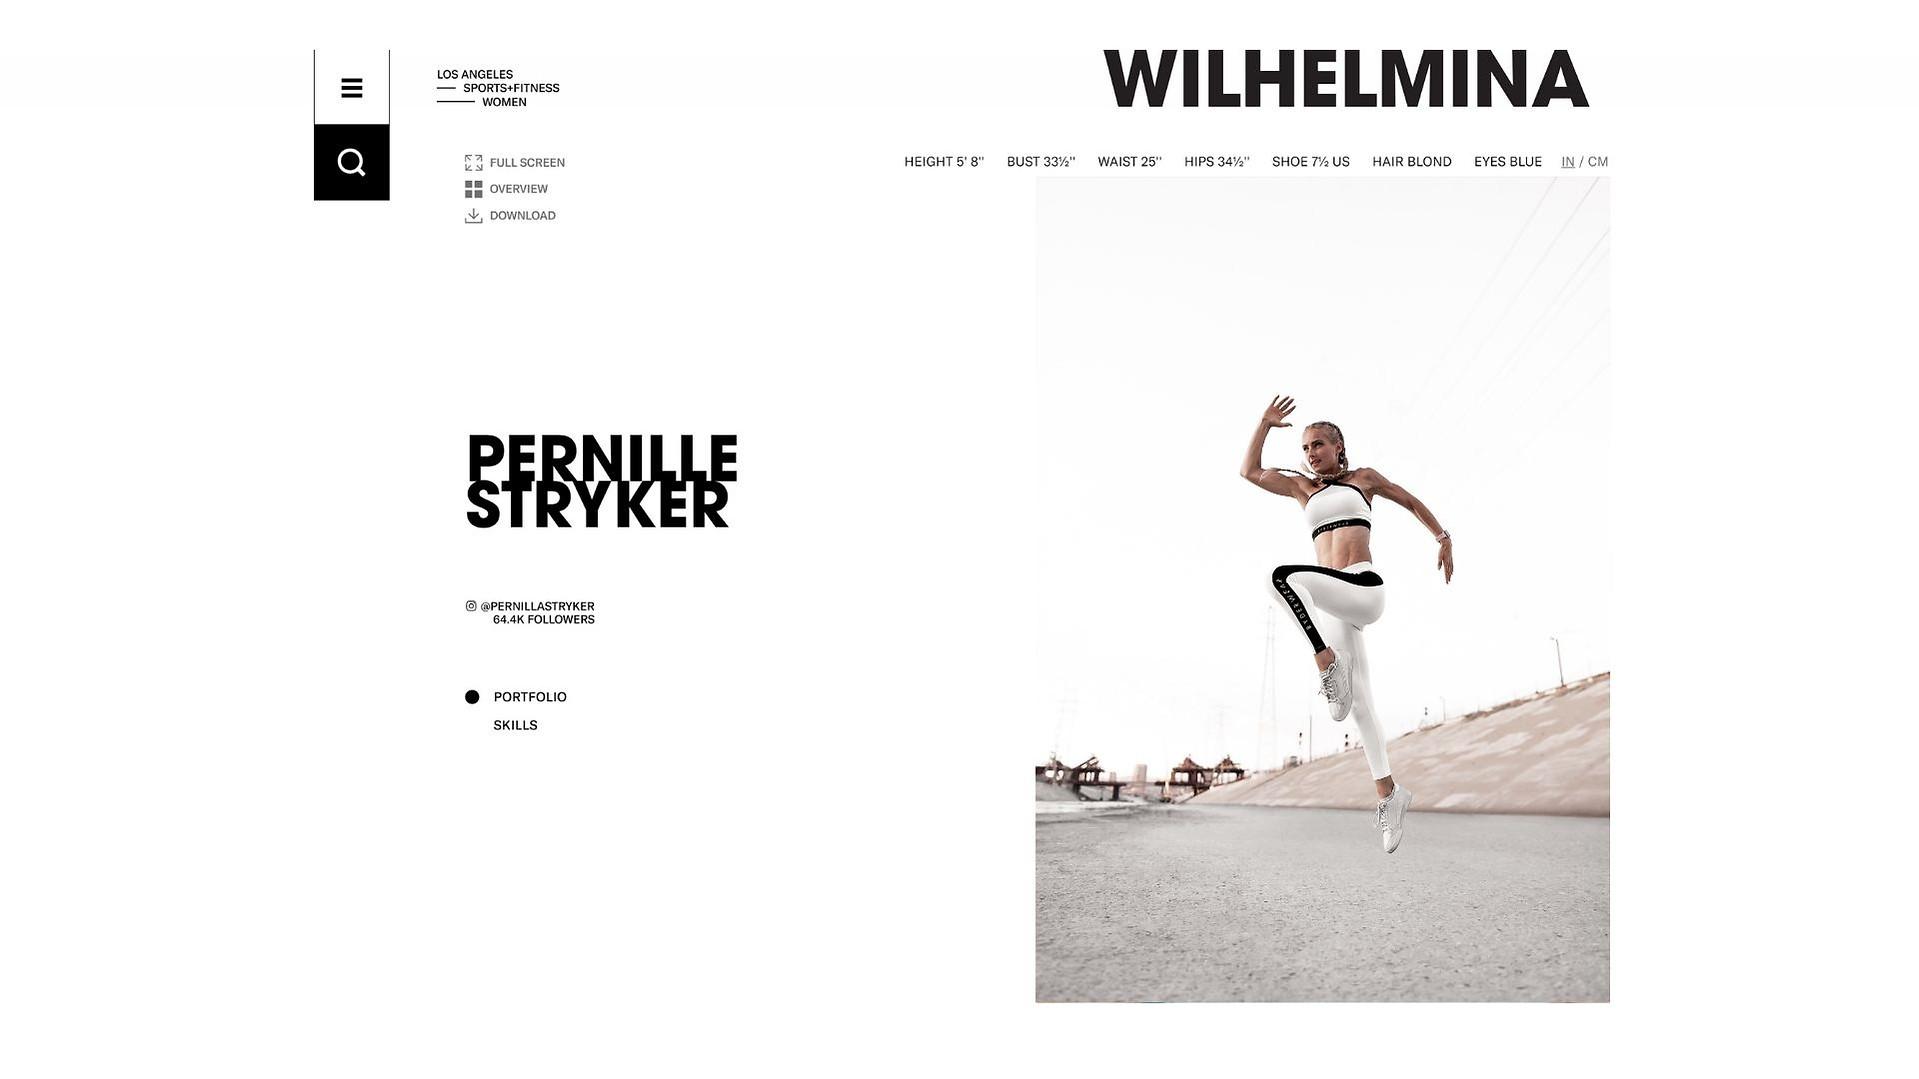 Pernilla Stryker - Alvin YJ Kim LA Photographer